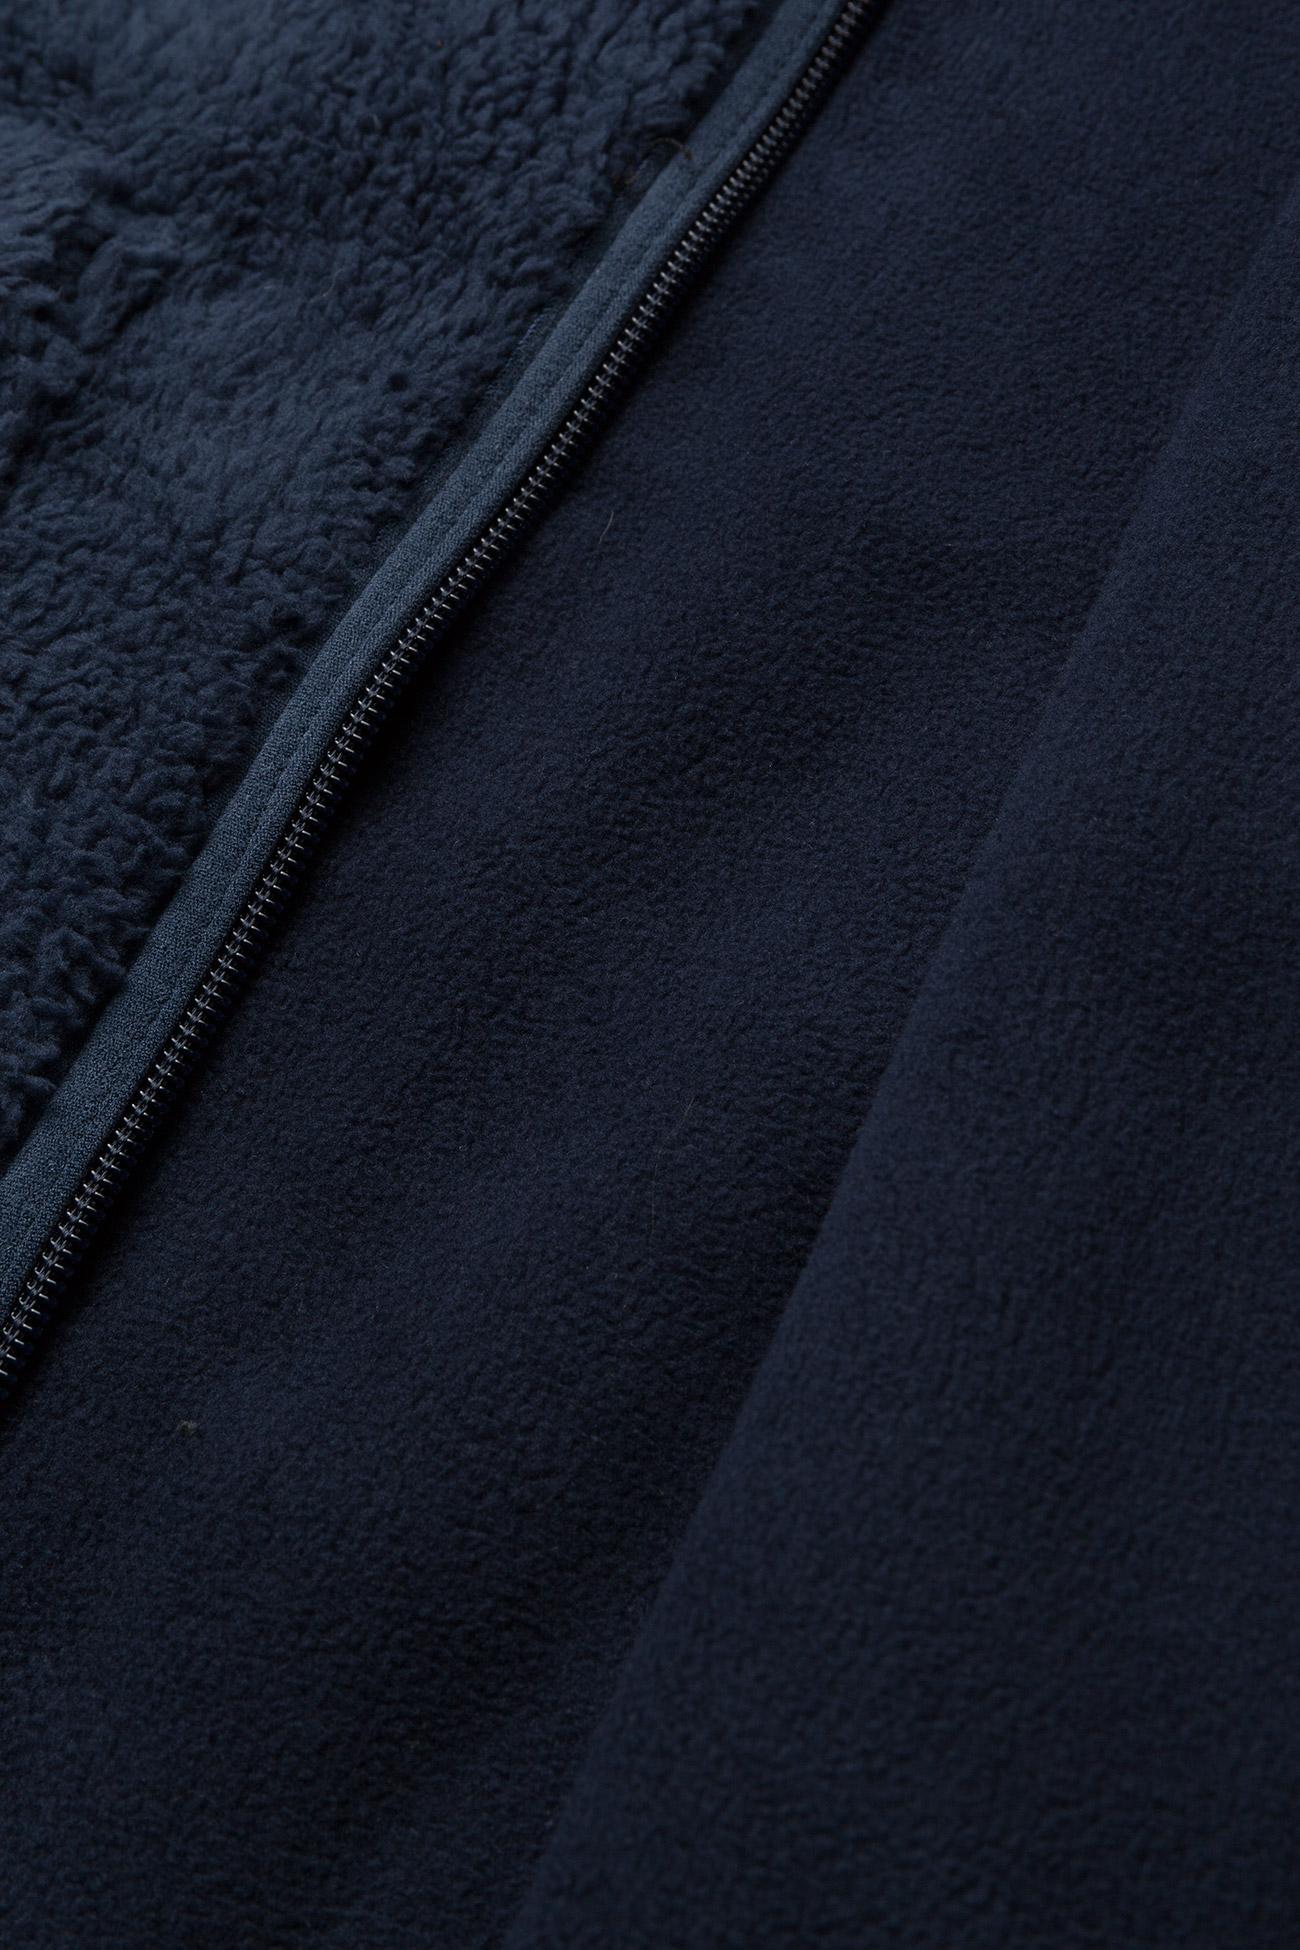 Resteröds Original Fleece Jacket - Sweatshirts GREY - Menn Klær